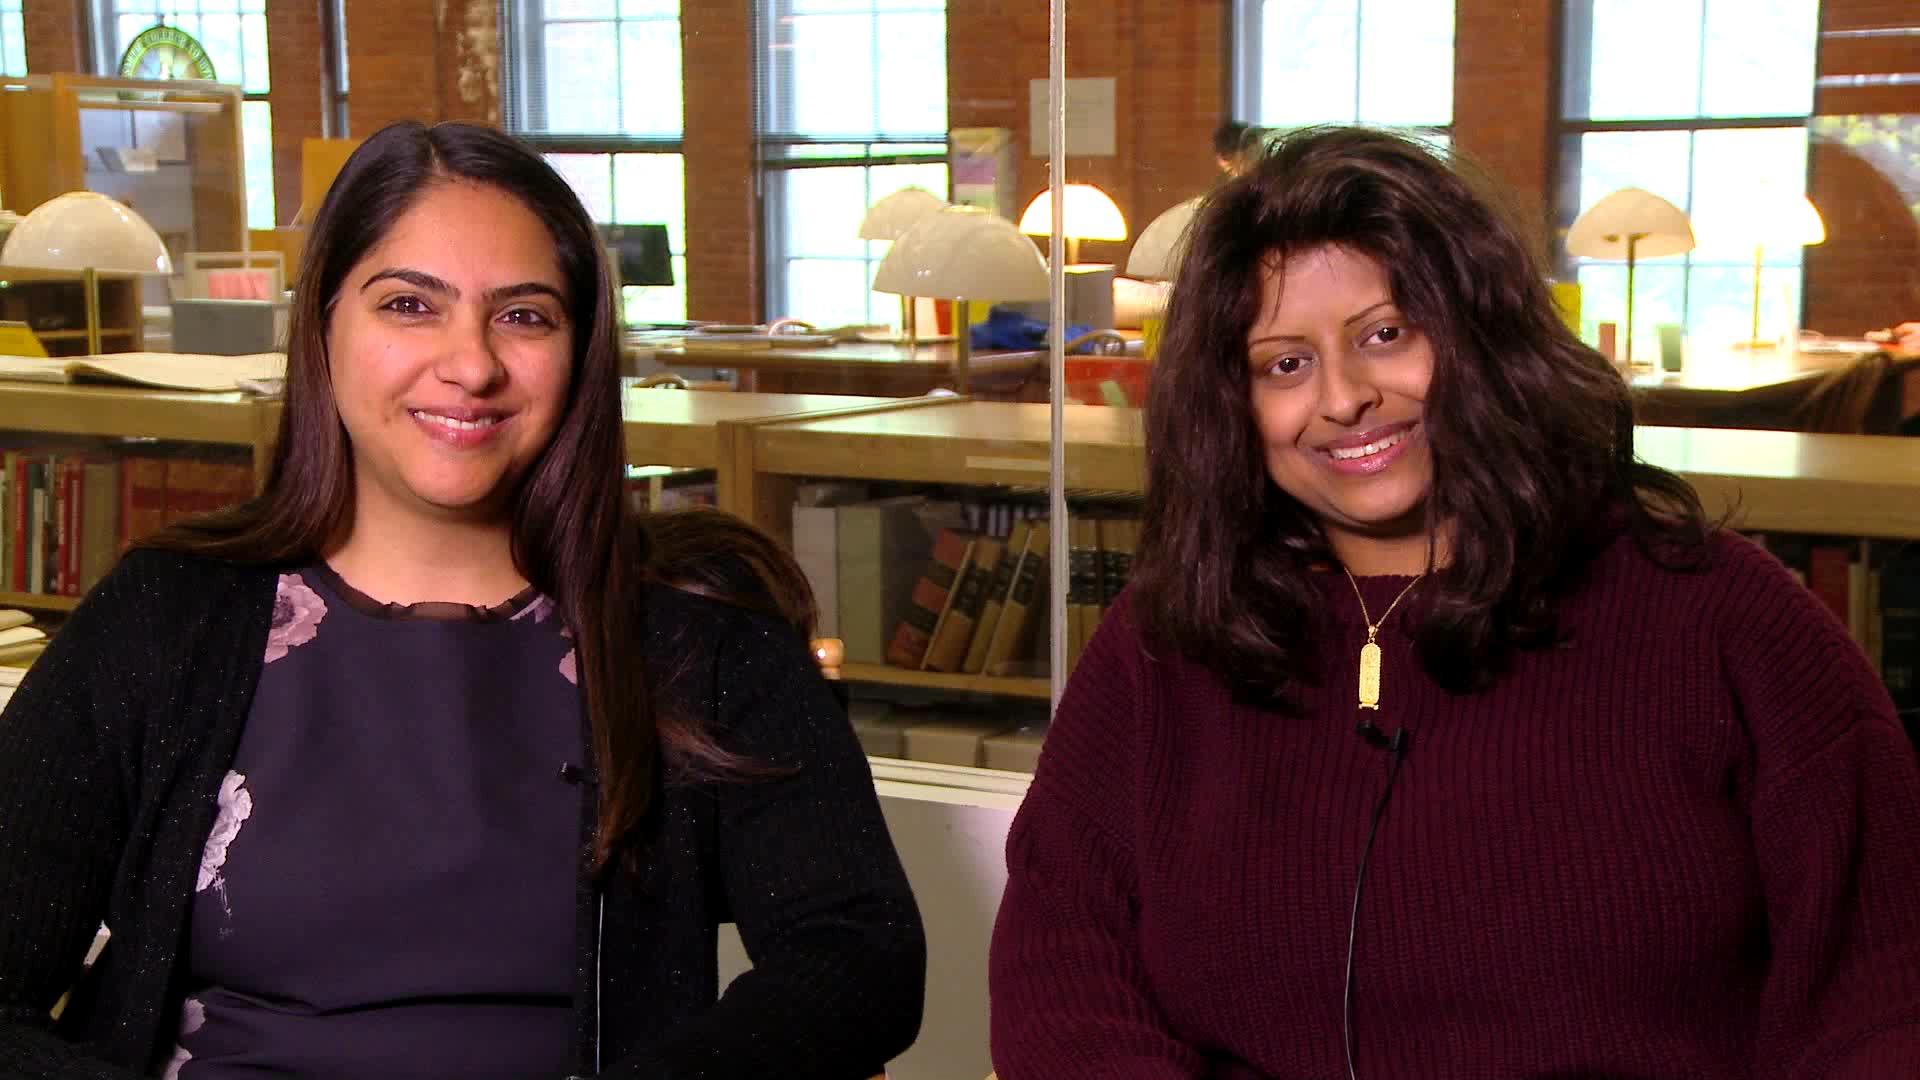 Neelofer Chaudry and Mahima Joishy, Class of 1996